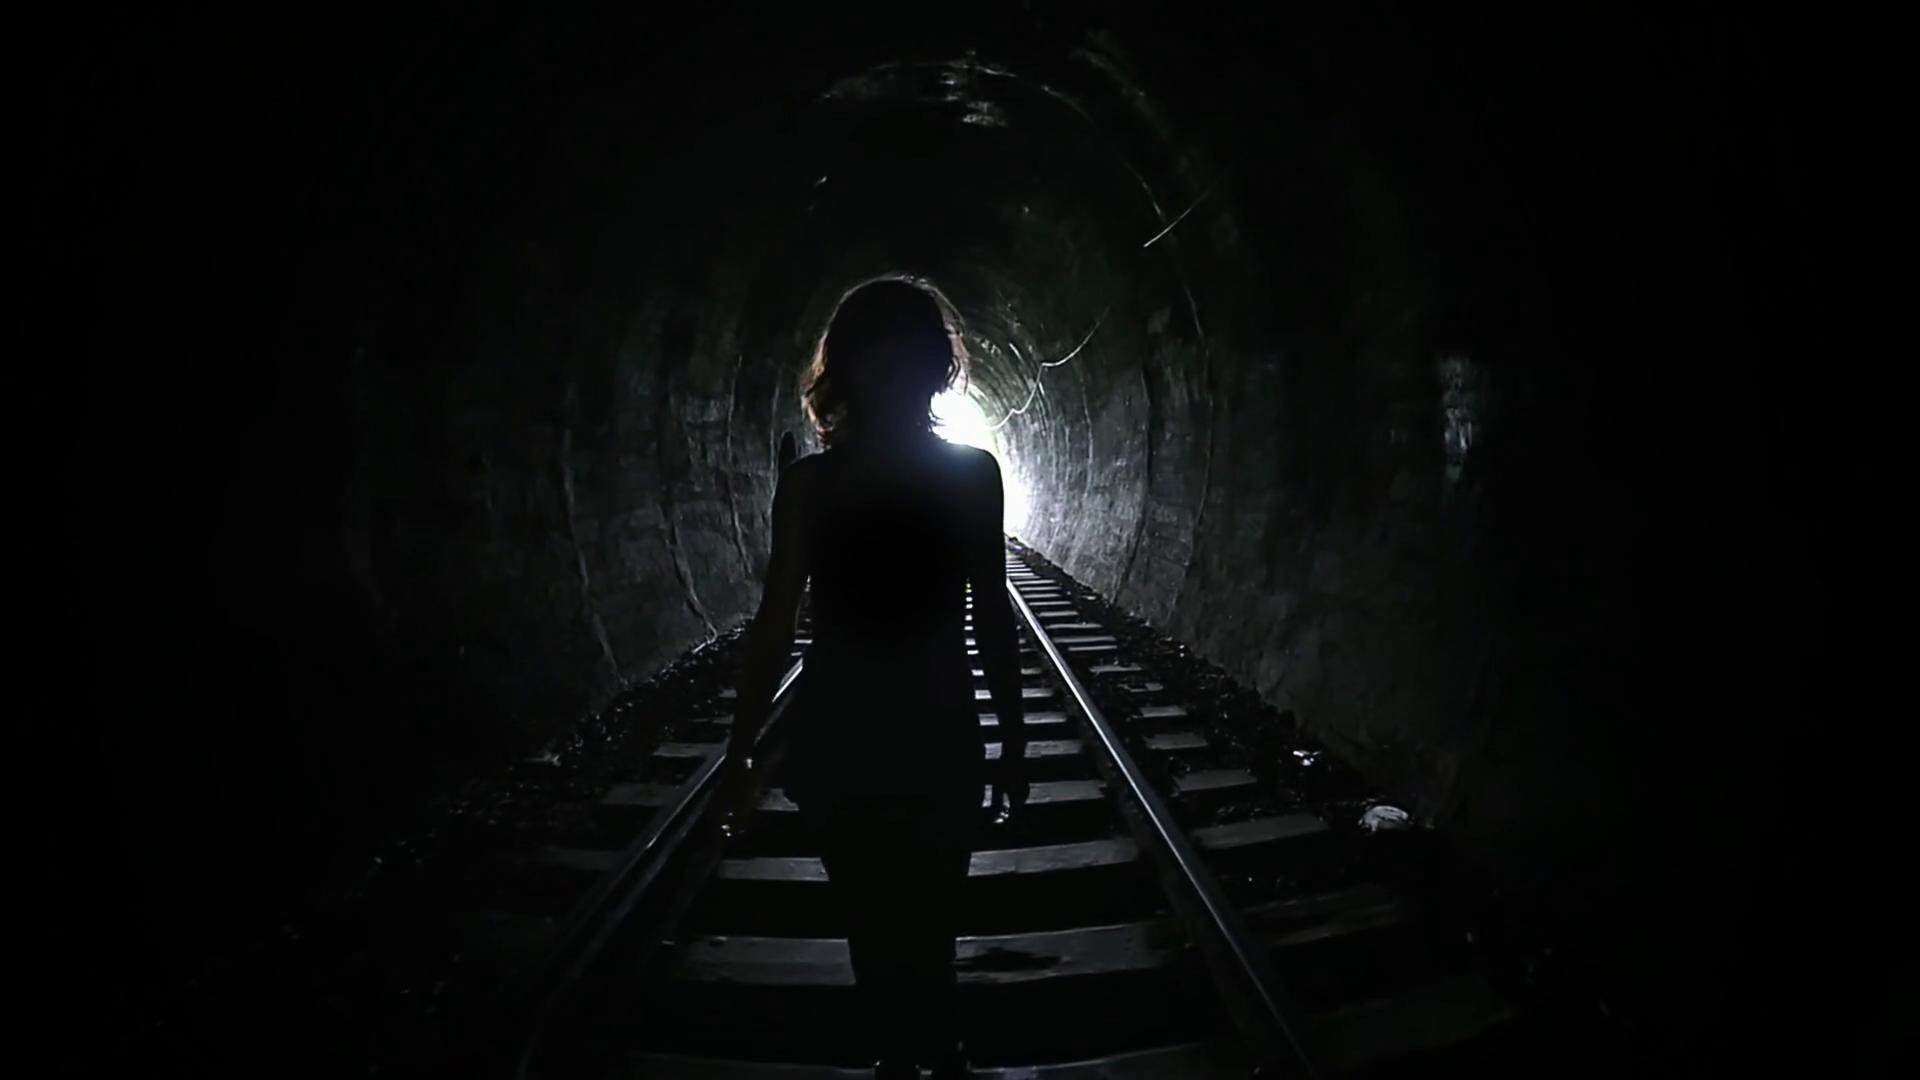 Mysterious woman walking in dark tunnel. Female silhouette on ...